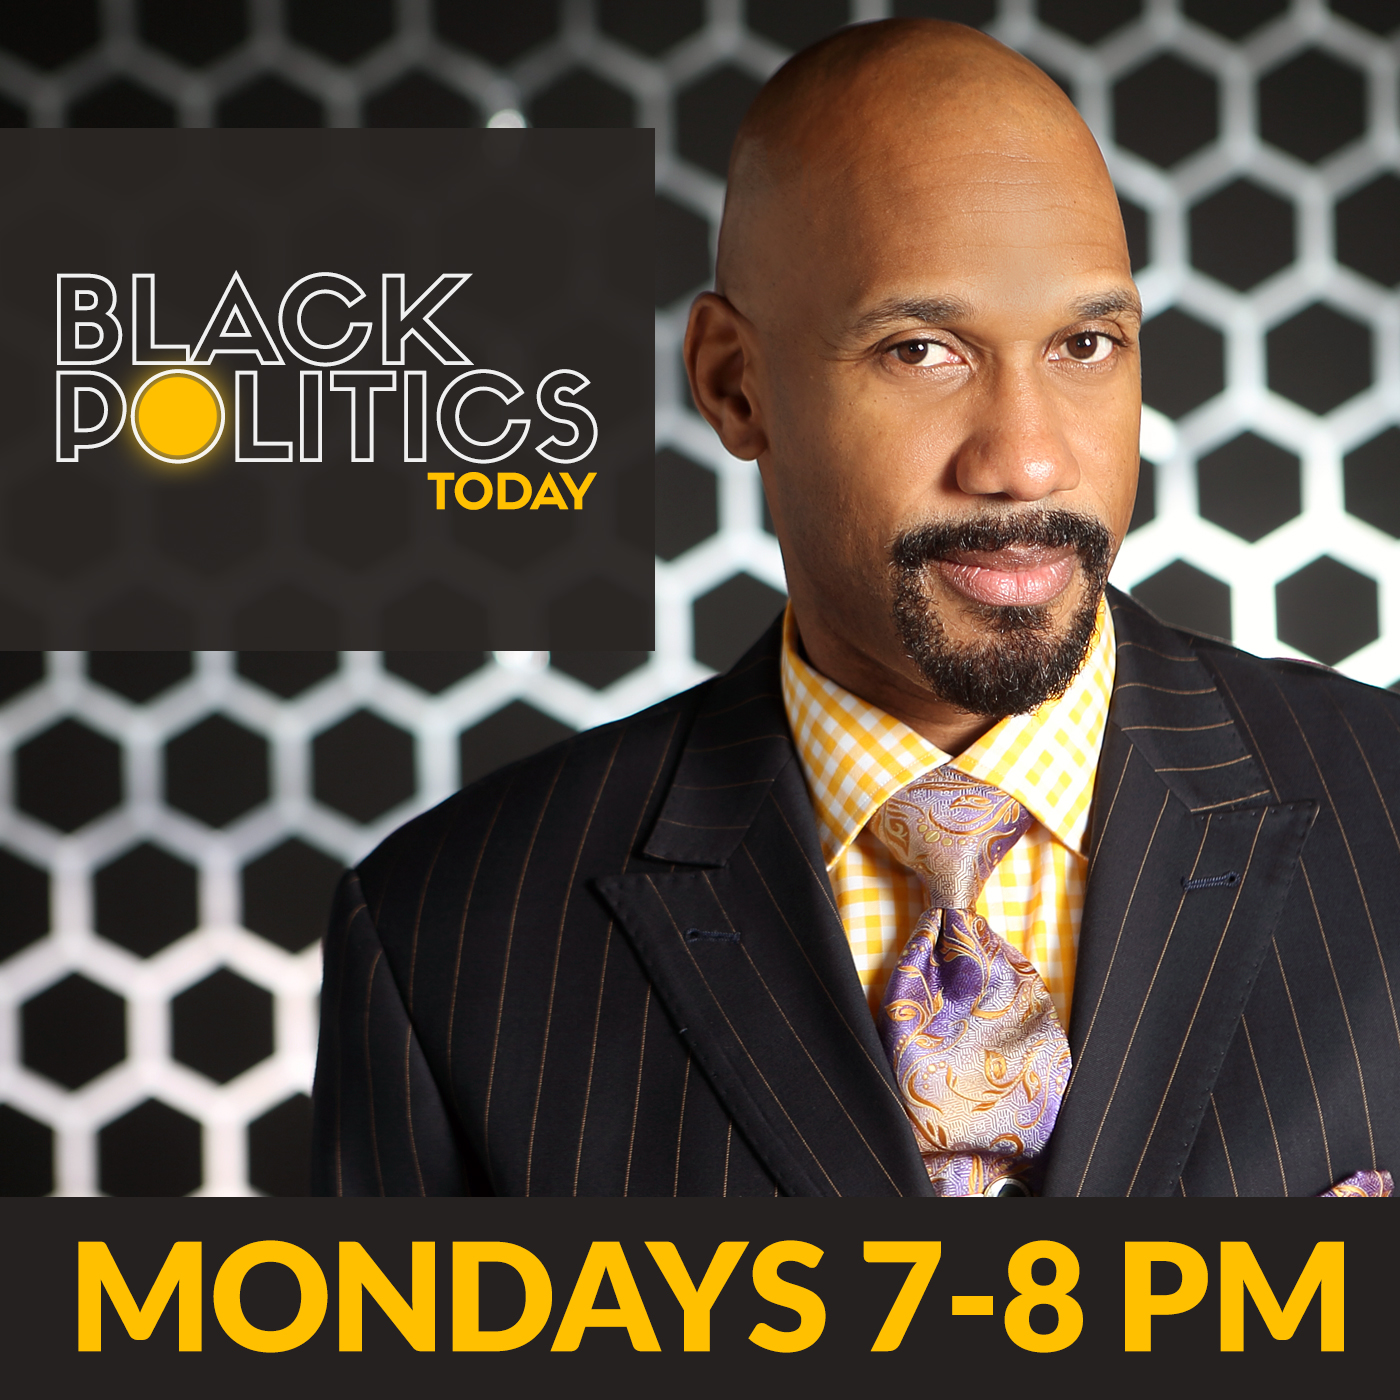 Black Politics Today logo